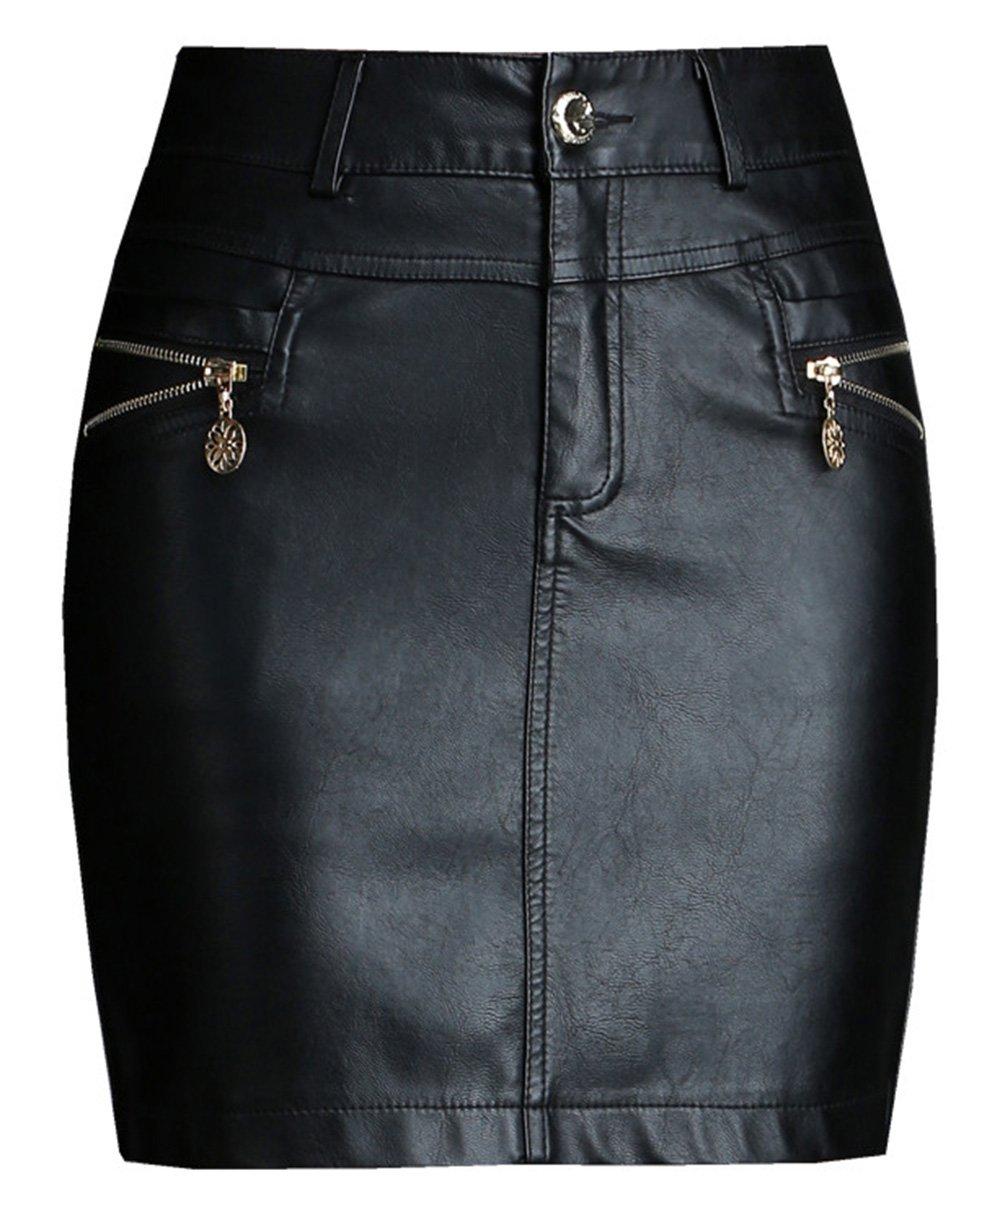 Basic Skirts Trendy XU Black Fine PU Leather Hip One Step Short Mini Skirts (XL)